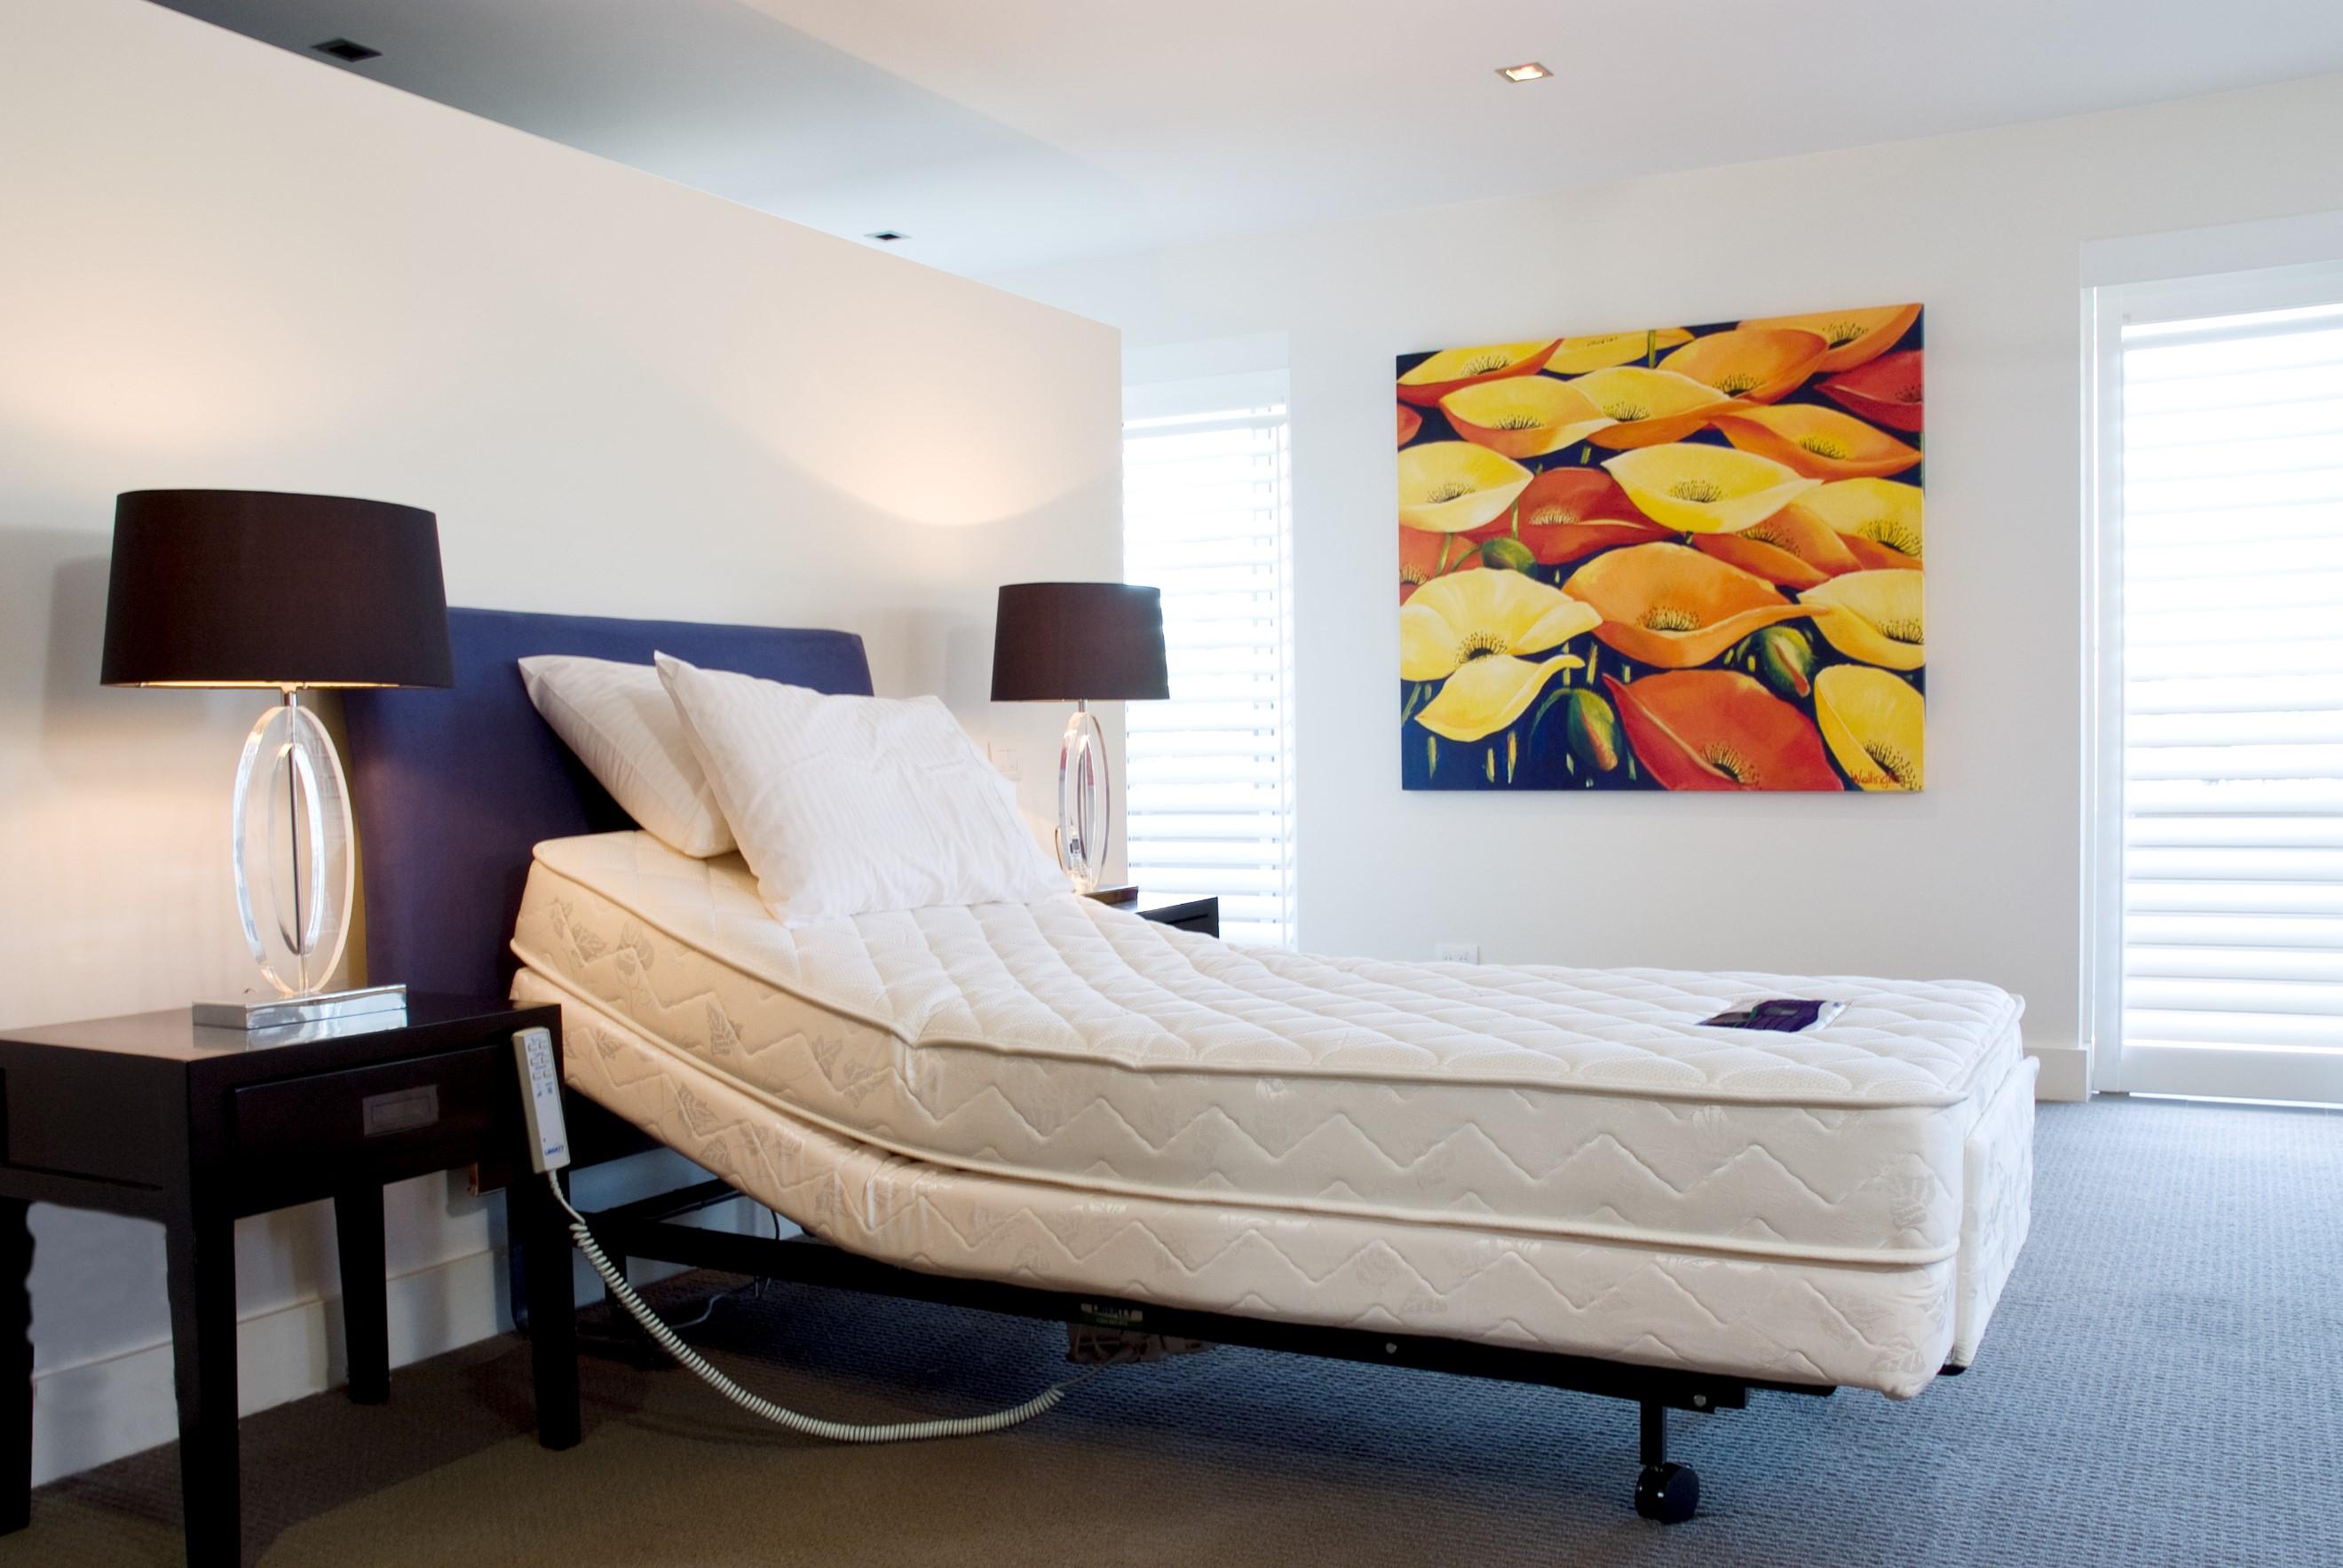 liberty bed